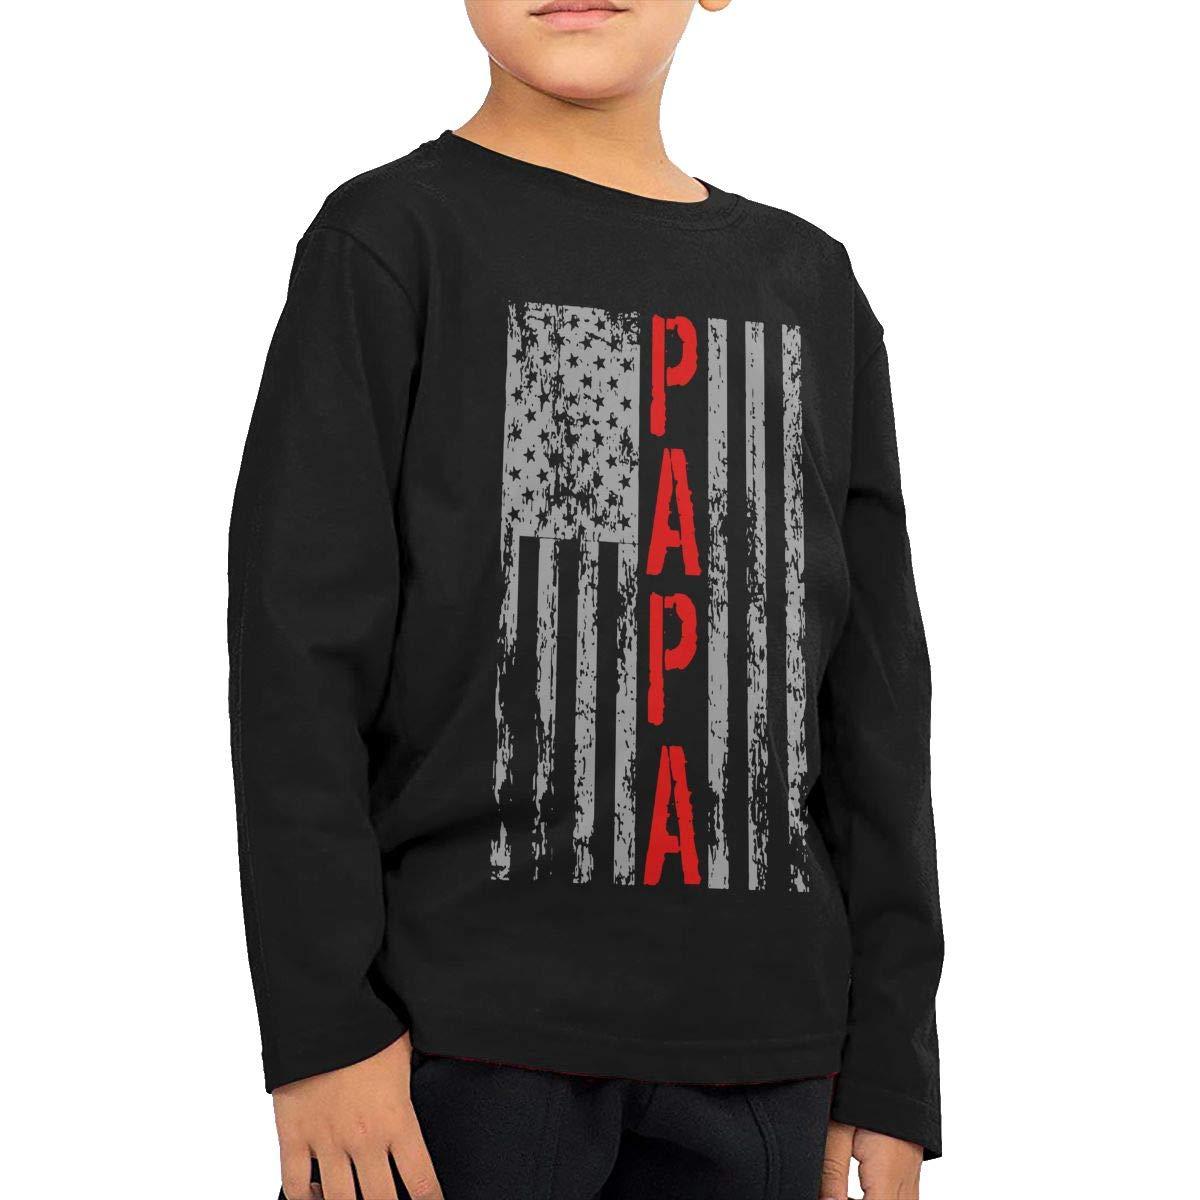 Baby Girls Childrens USA PAPA Retro Vintage Flag Printed Long Sleeve 100/% Cotton Infants T-Shirts